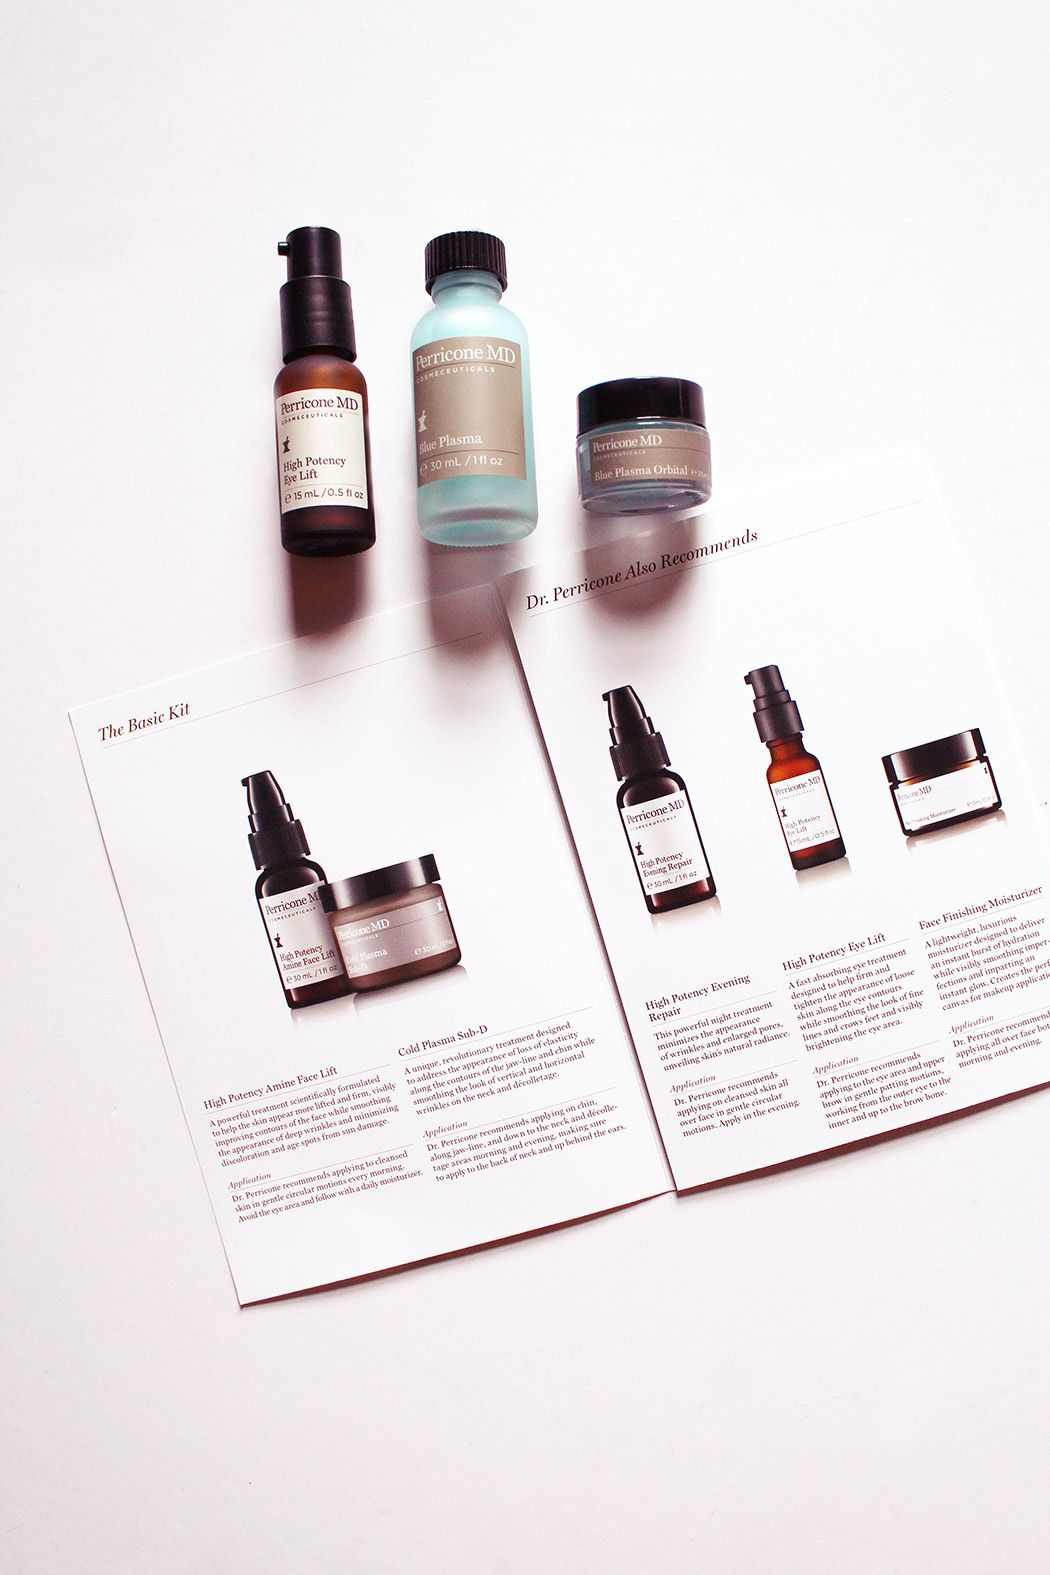 Pin de LíMor Cosmetics en Perricone MD